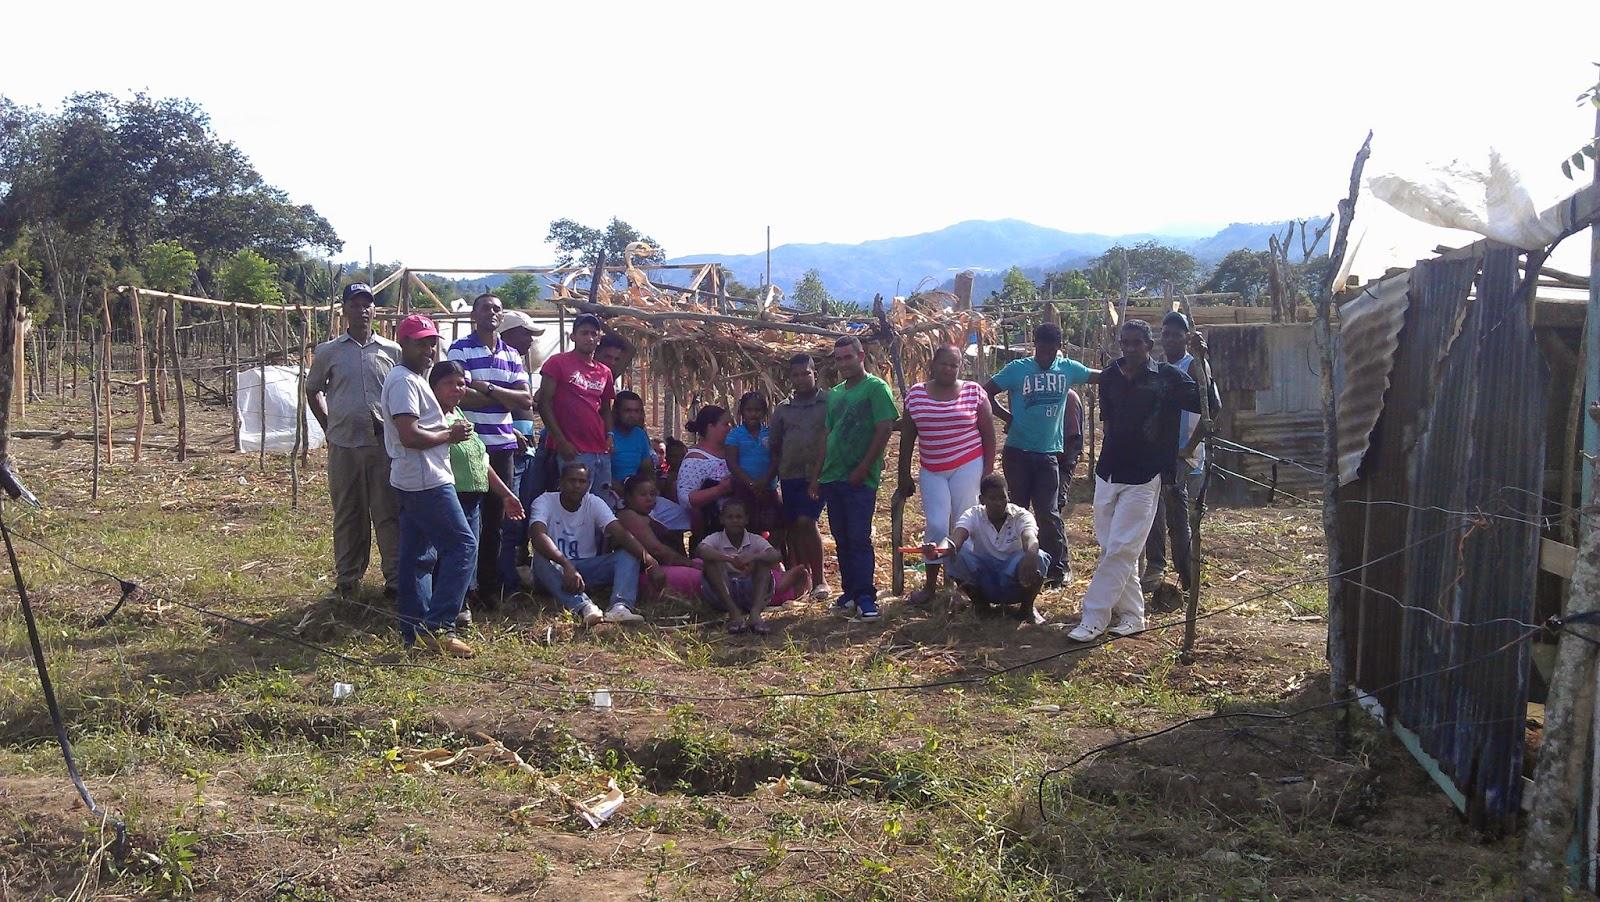 rancho arriba milf personals Rancho arriba is a town in the san josé de ocoa province of the dominican  republic climate[edit] hideclimate data for rancho arriba (1961–1990.